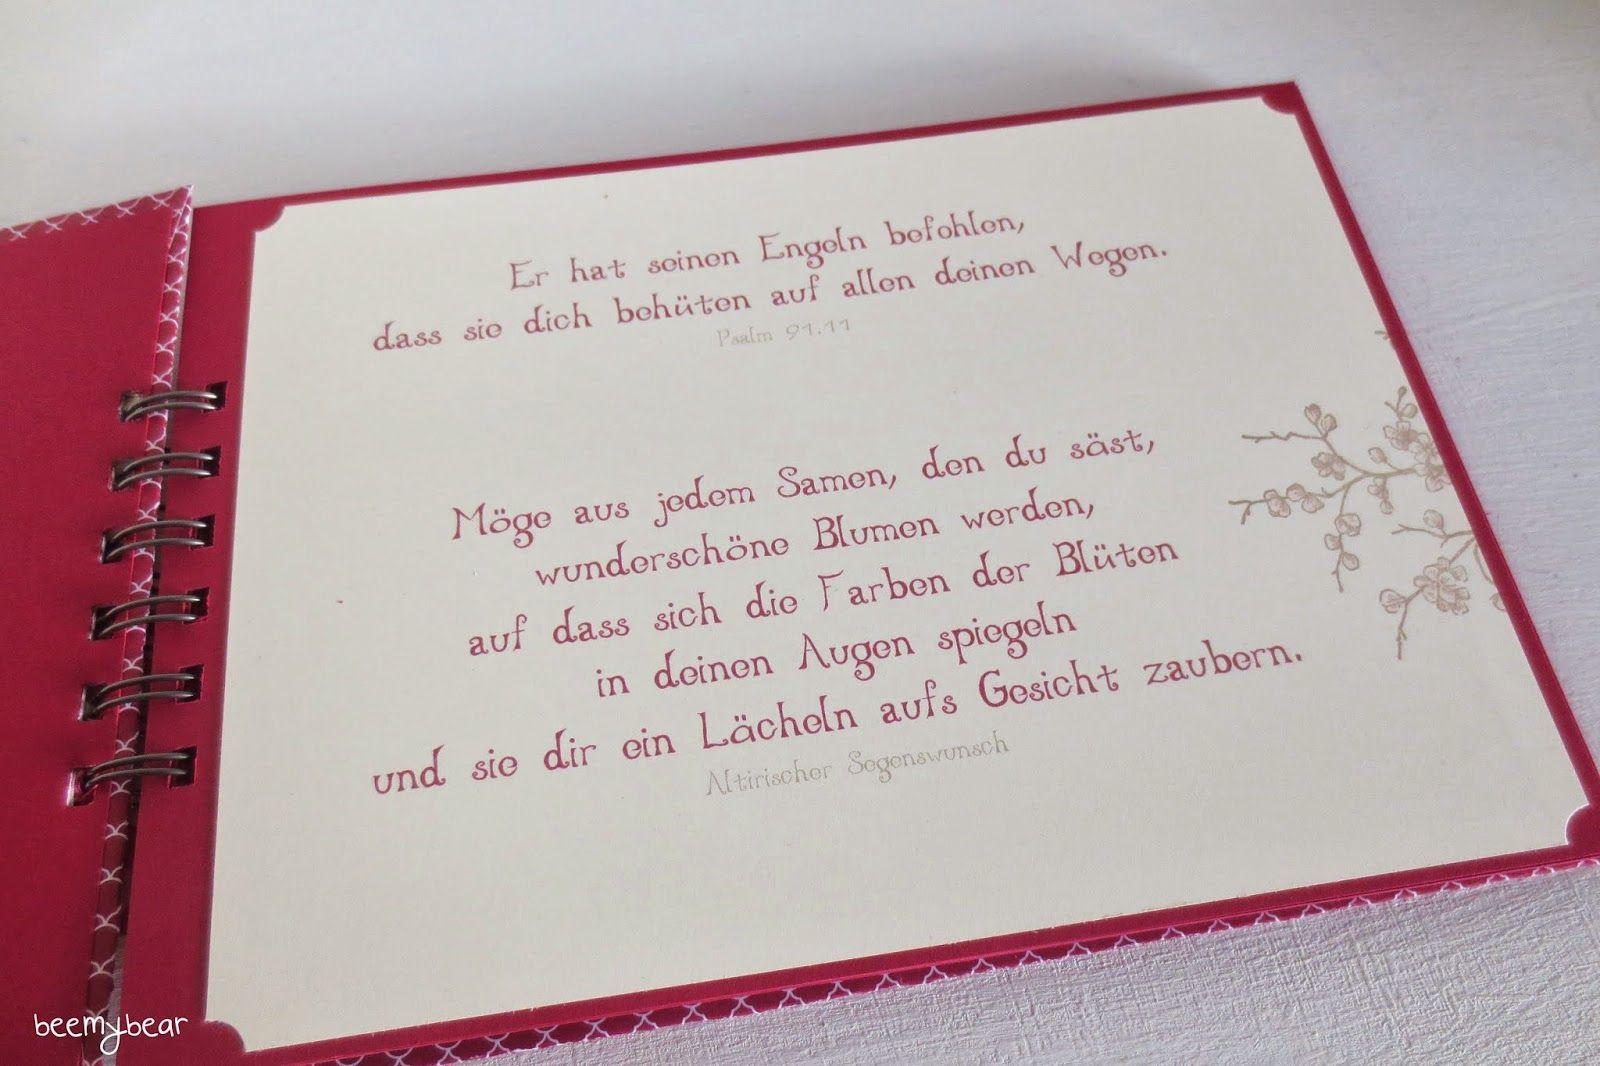 Stampin With Beemybear Gastebucher Gastebuch Hochzeit Gestalten Gastebuch Hochzeit Gastebuch